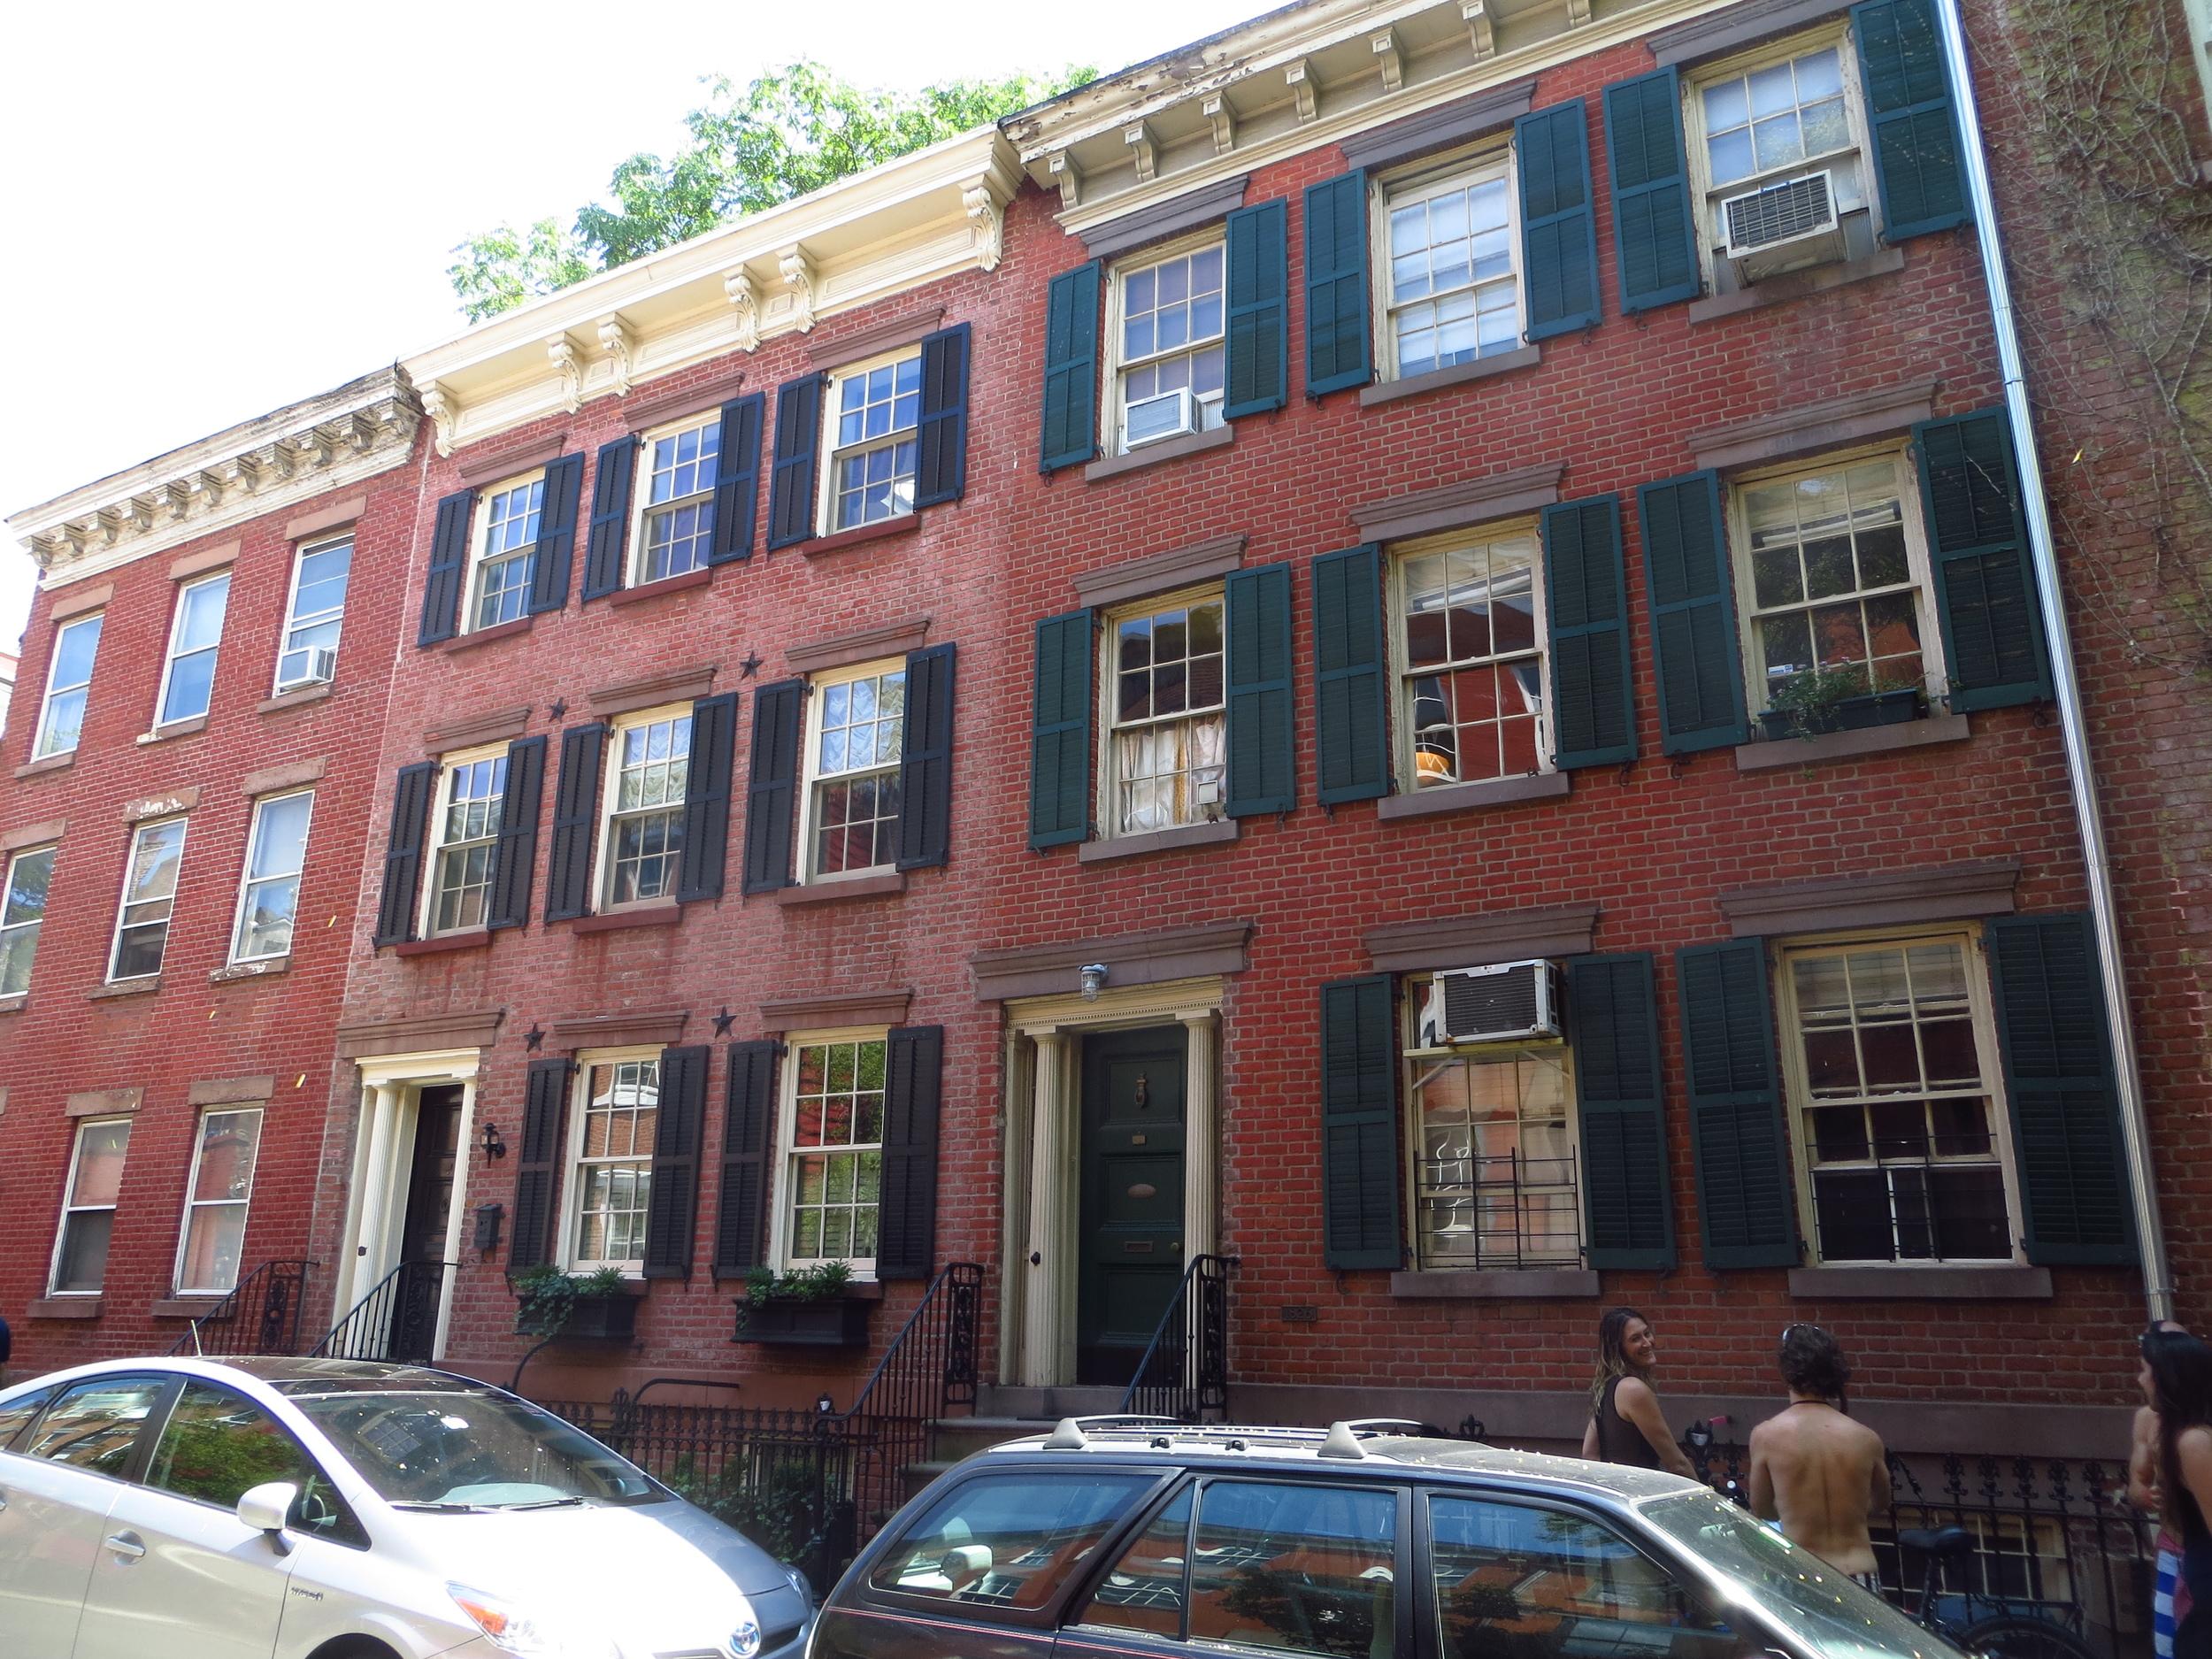 Houses built in 1826